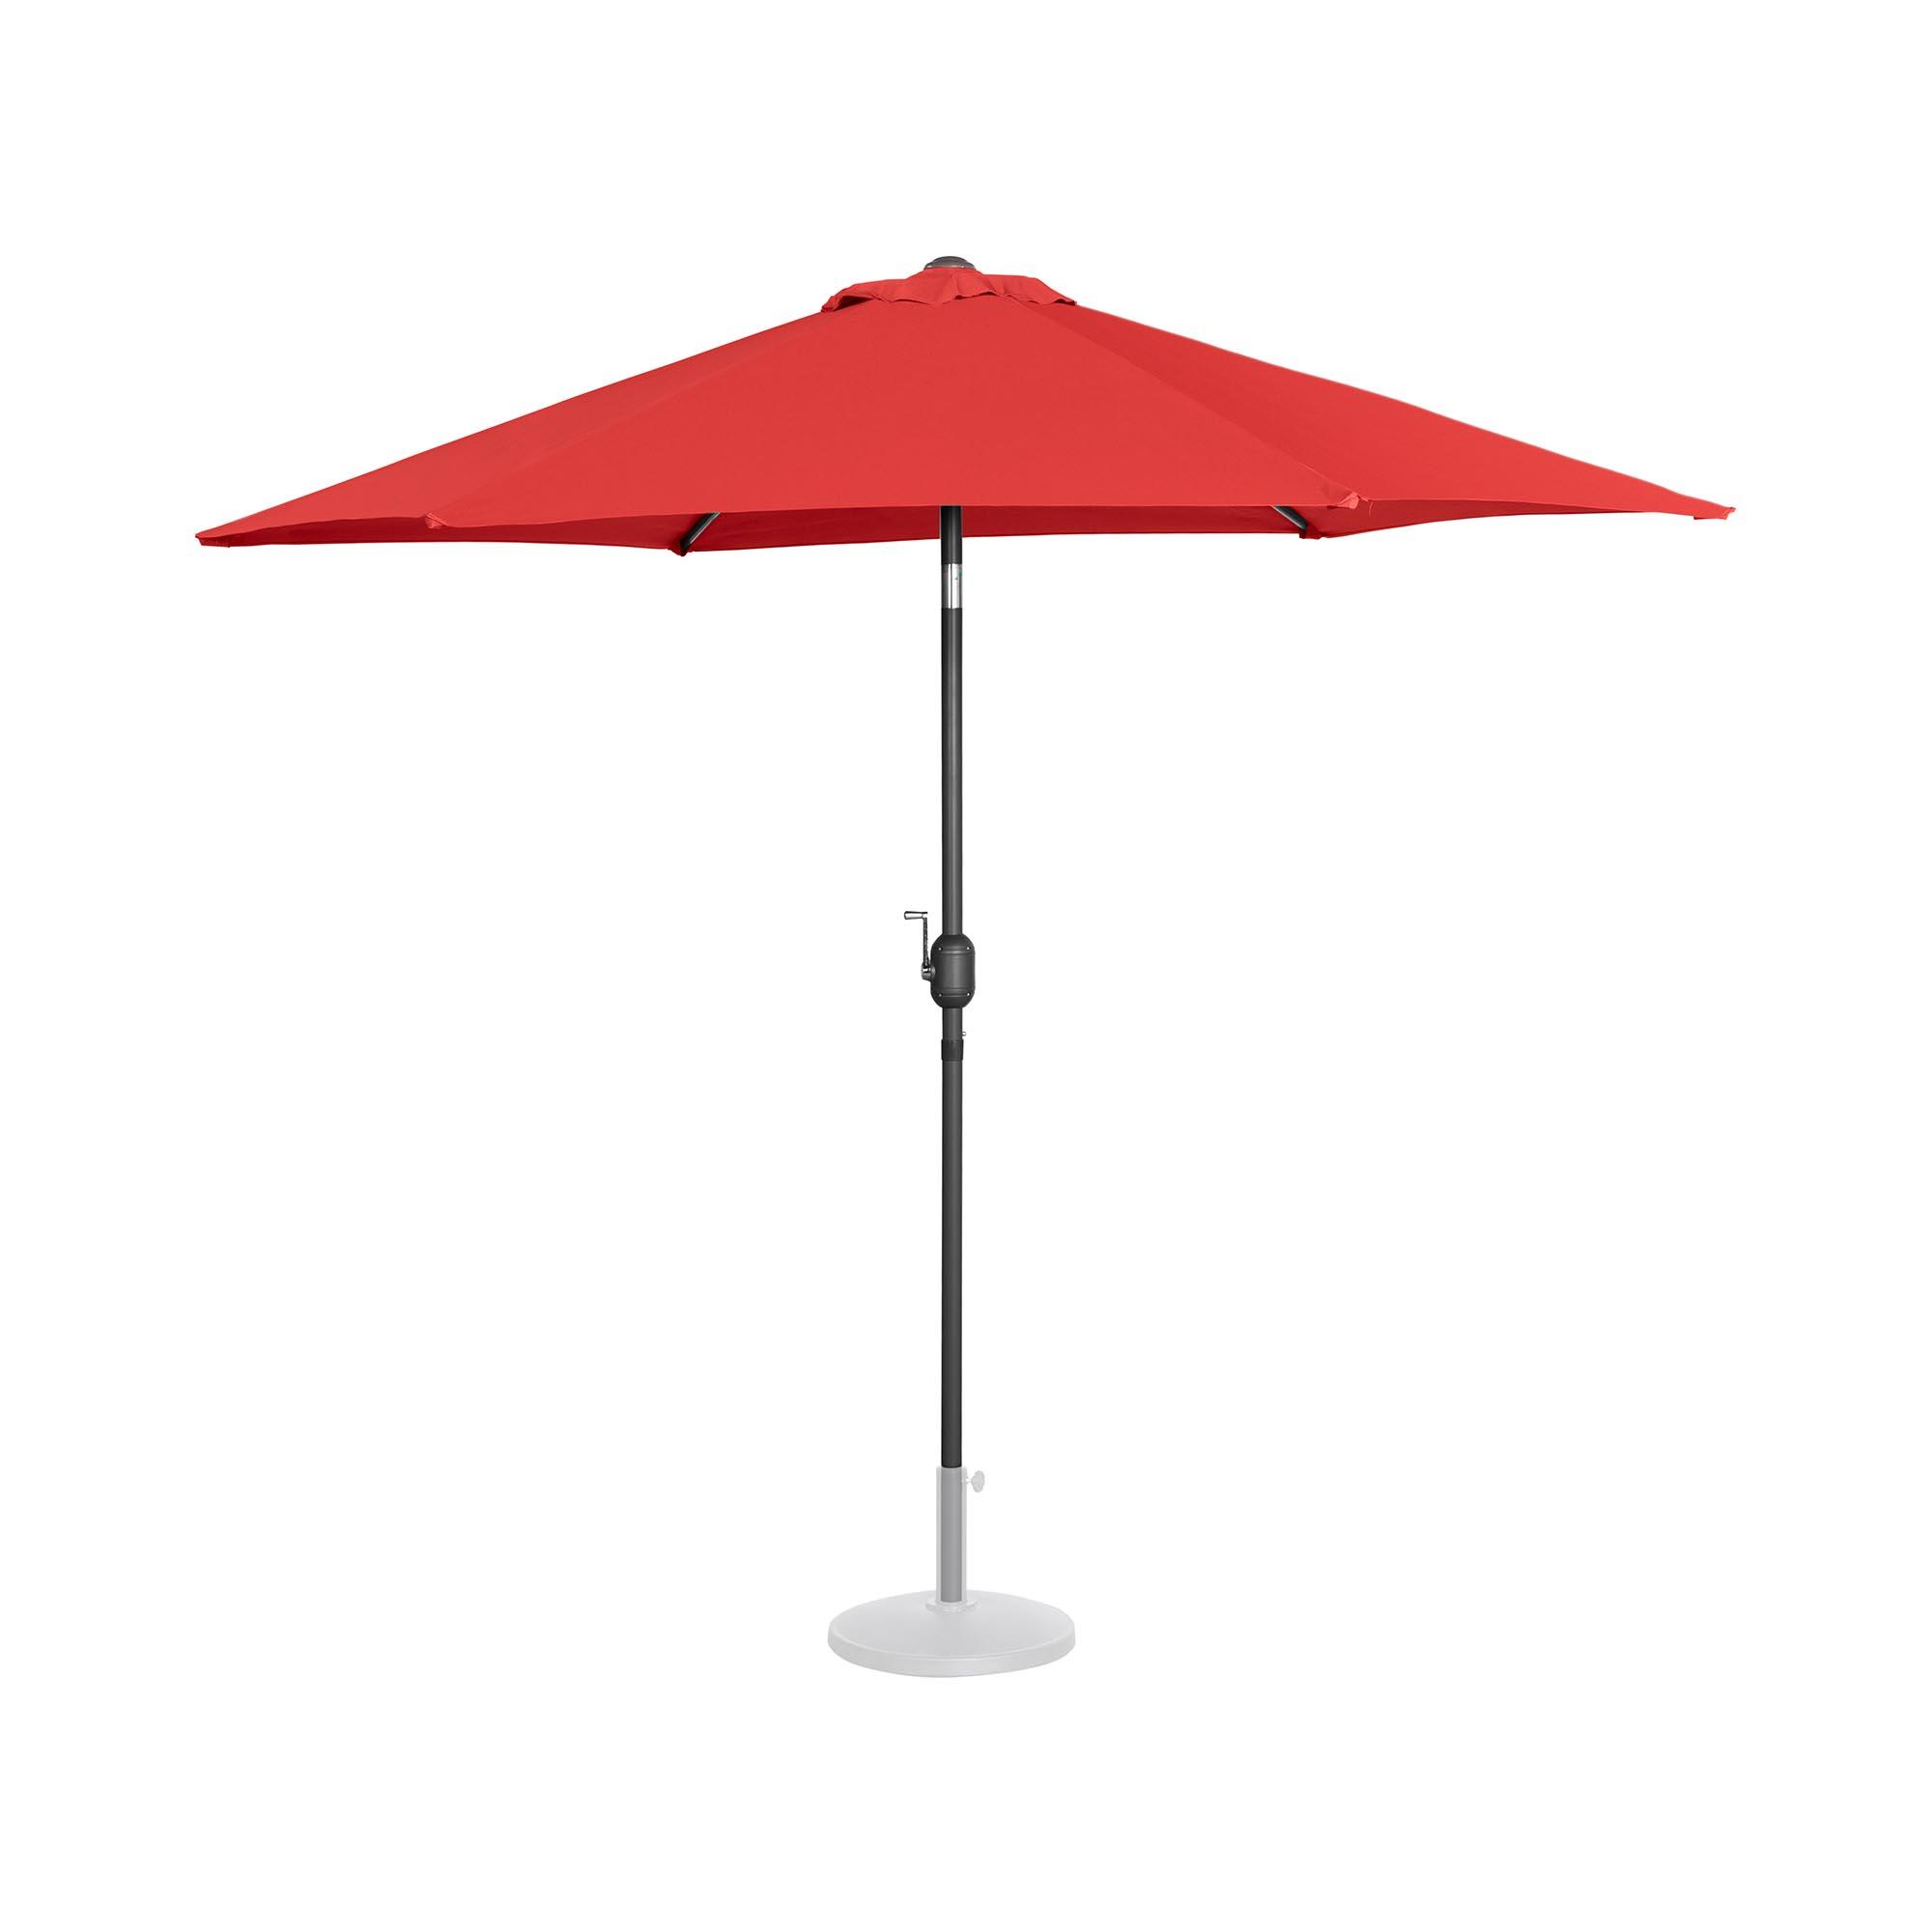 Uniprodo Sonnenschirm groß - rot - sechseckig - Ø 270 cm - neigbar UNI_UMBRELLA_R270RE